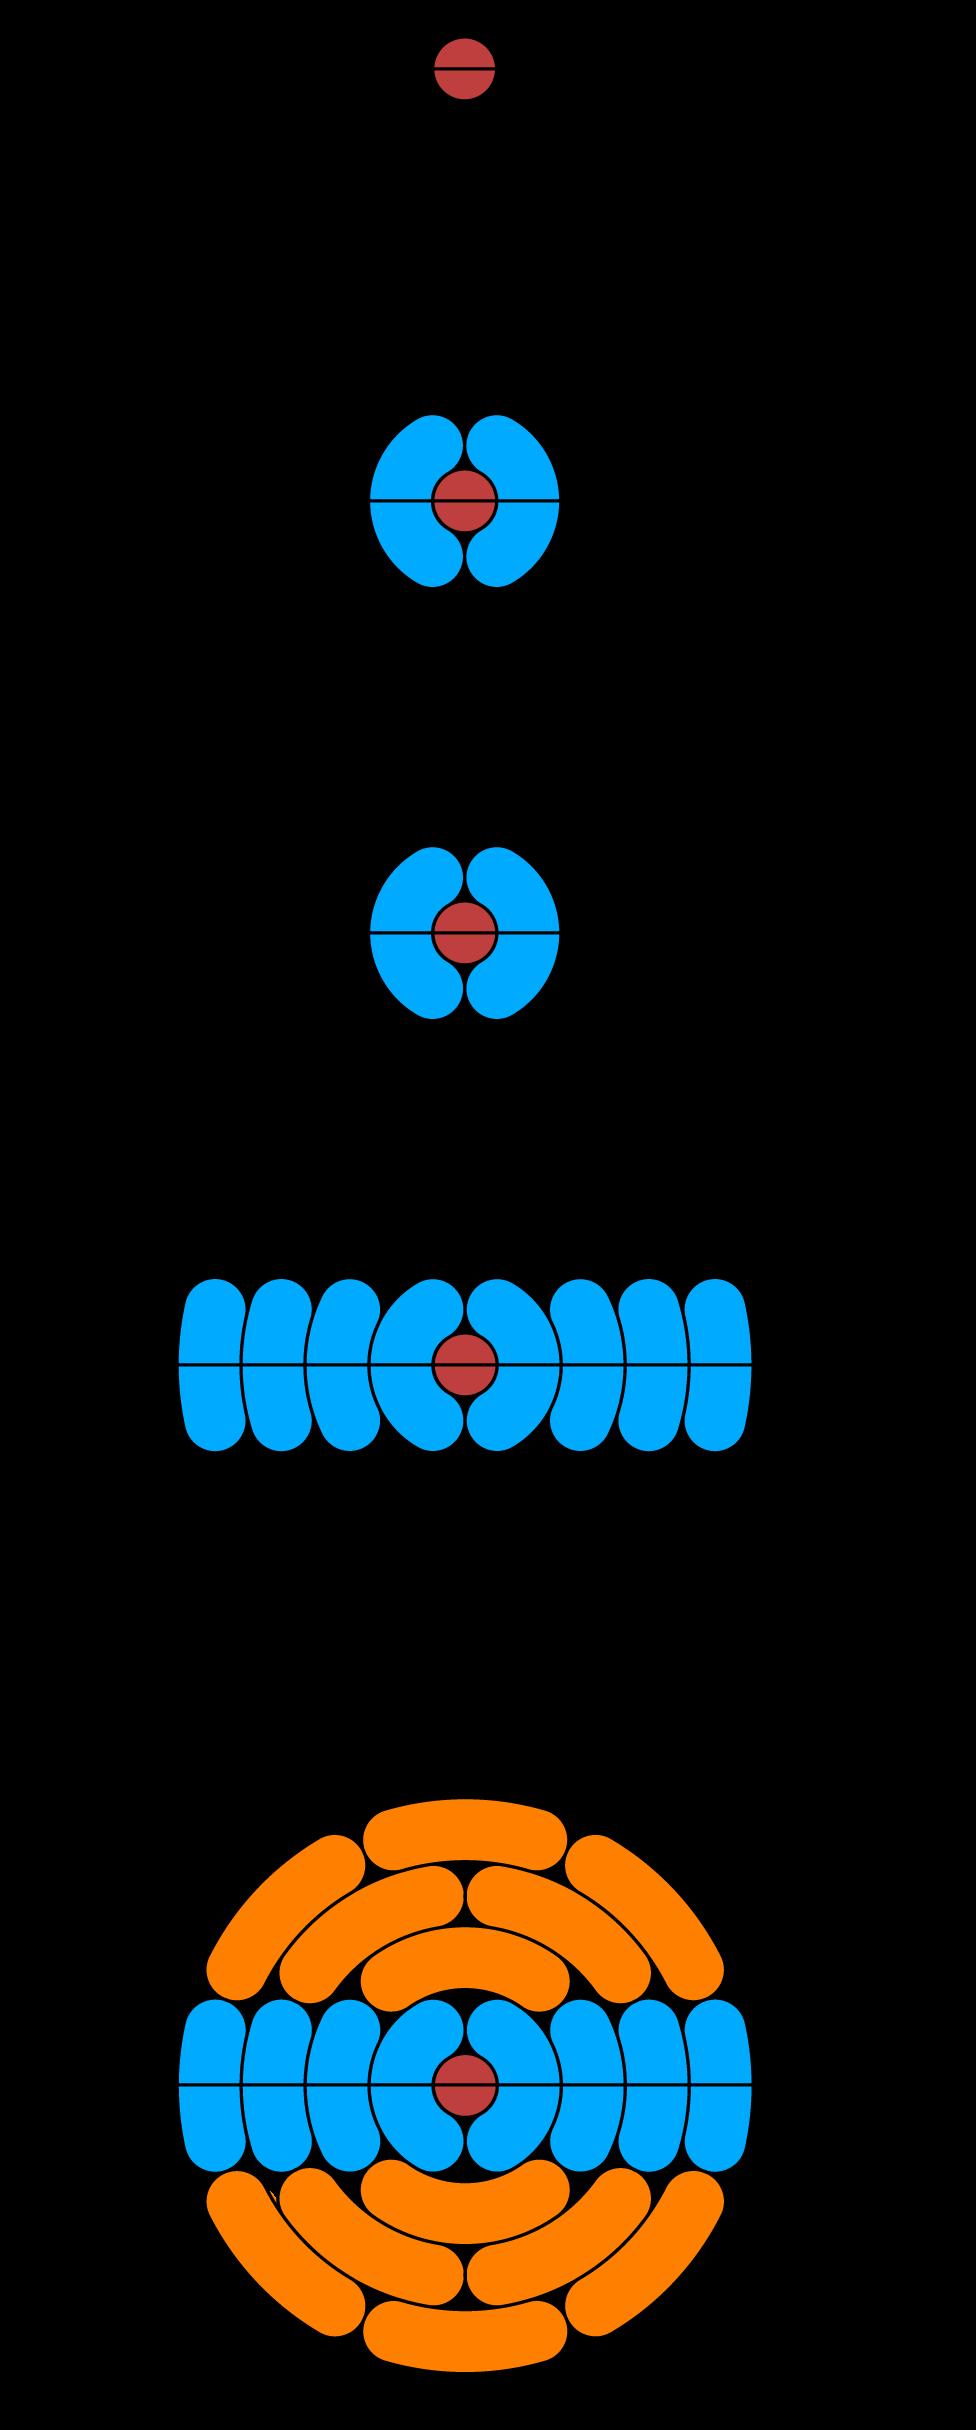 Digonal-spiral-fig3